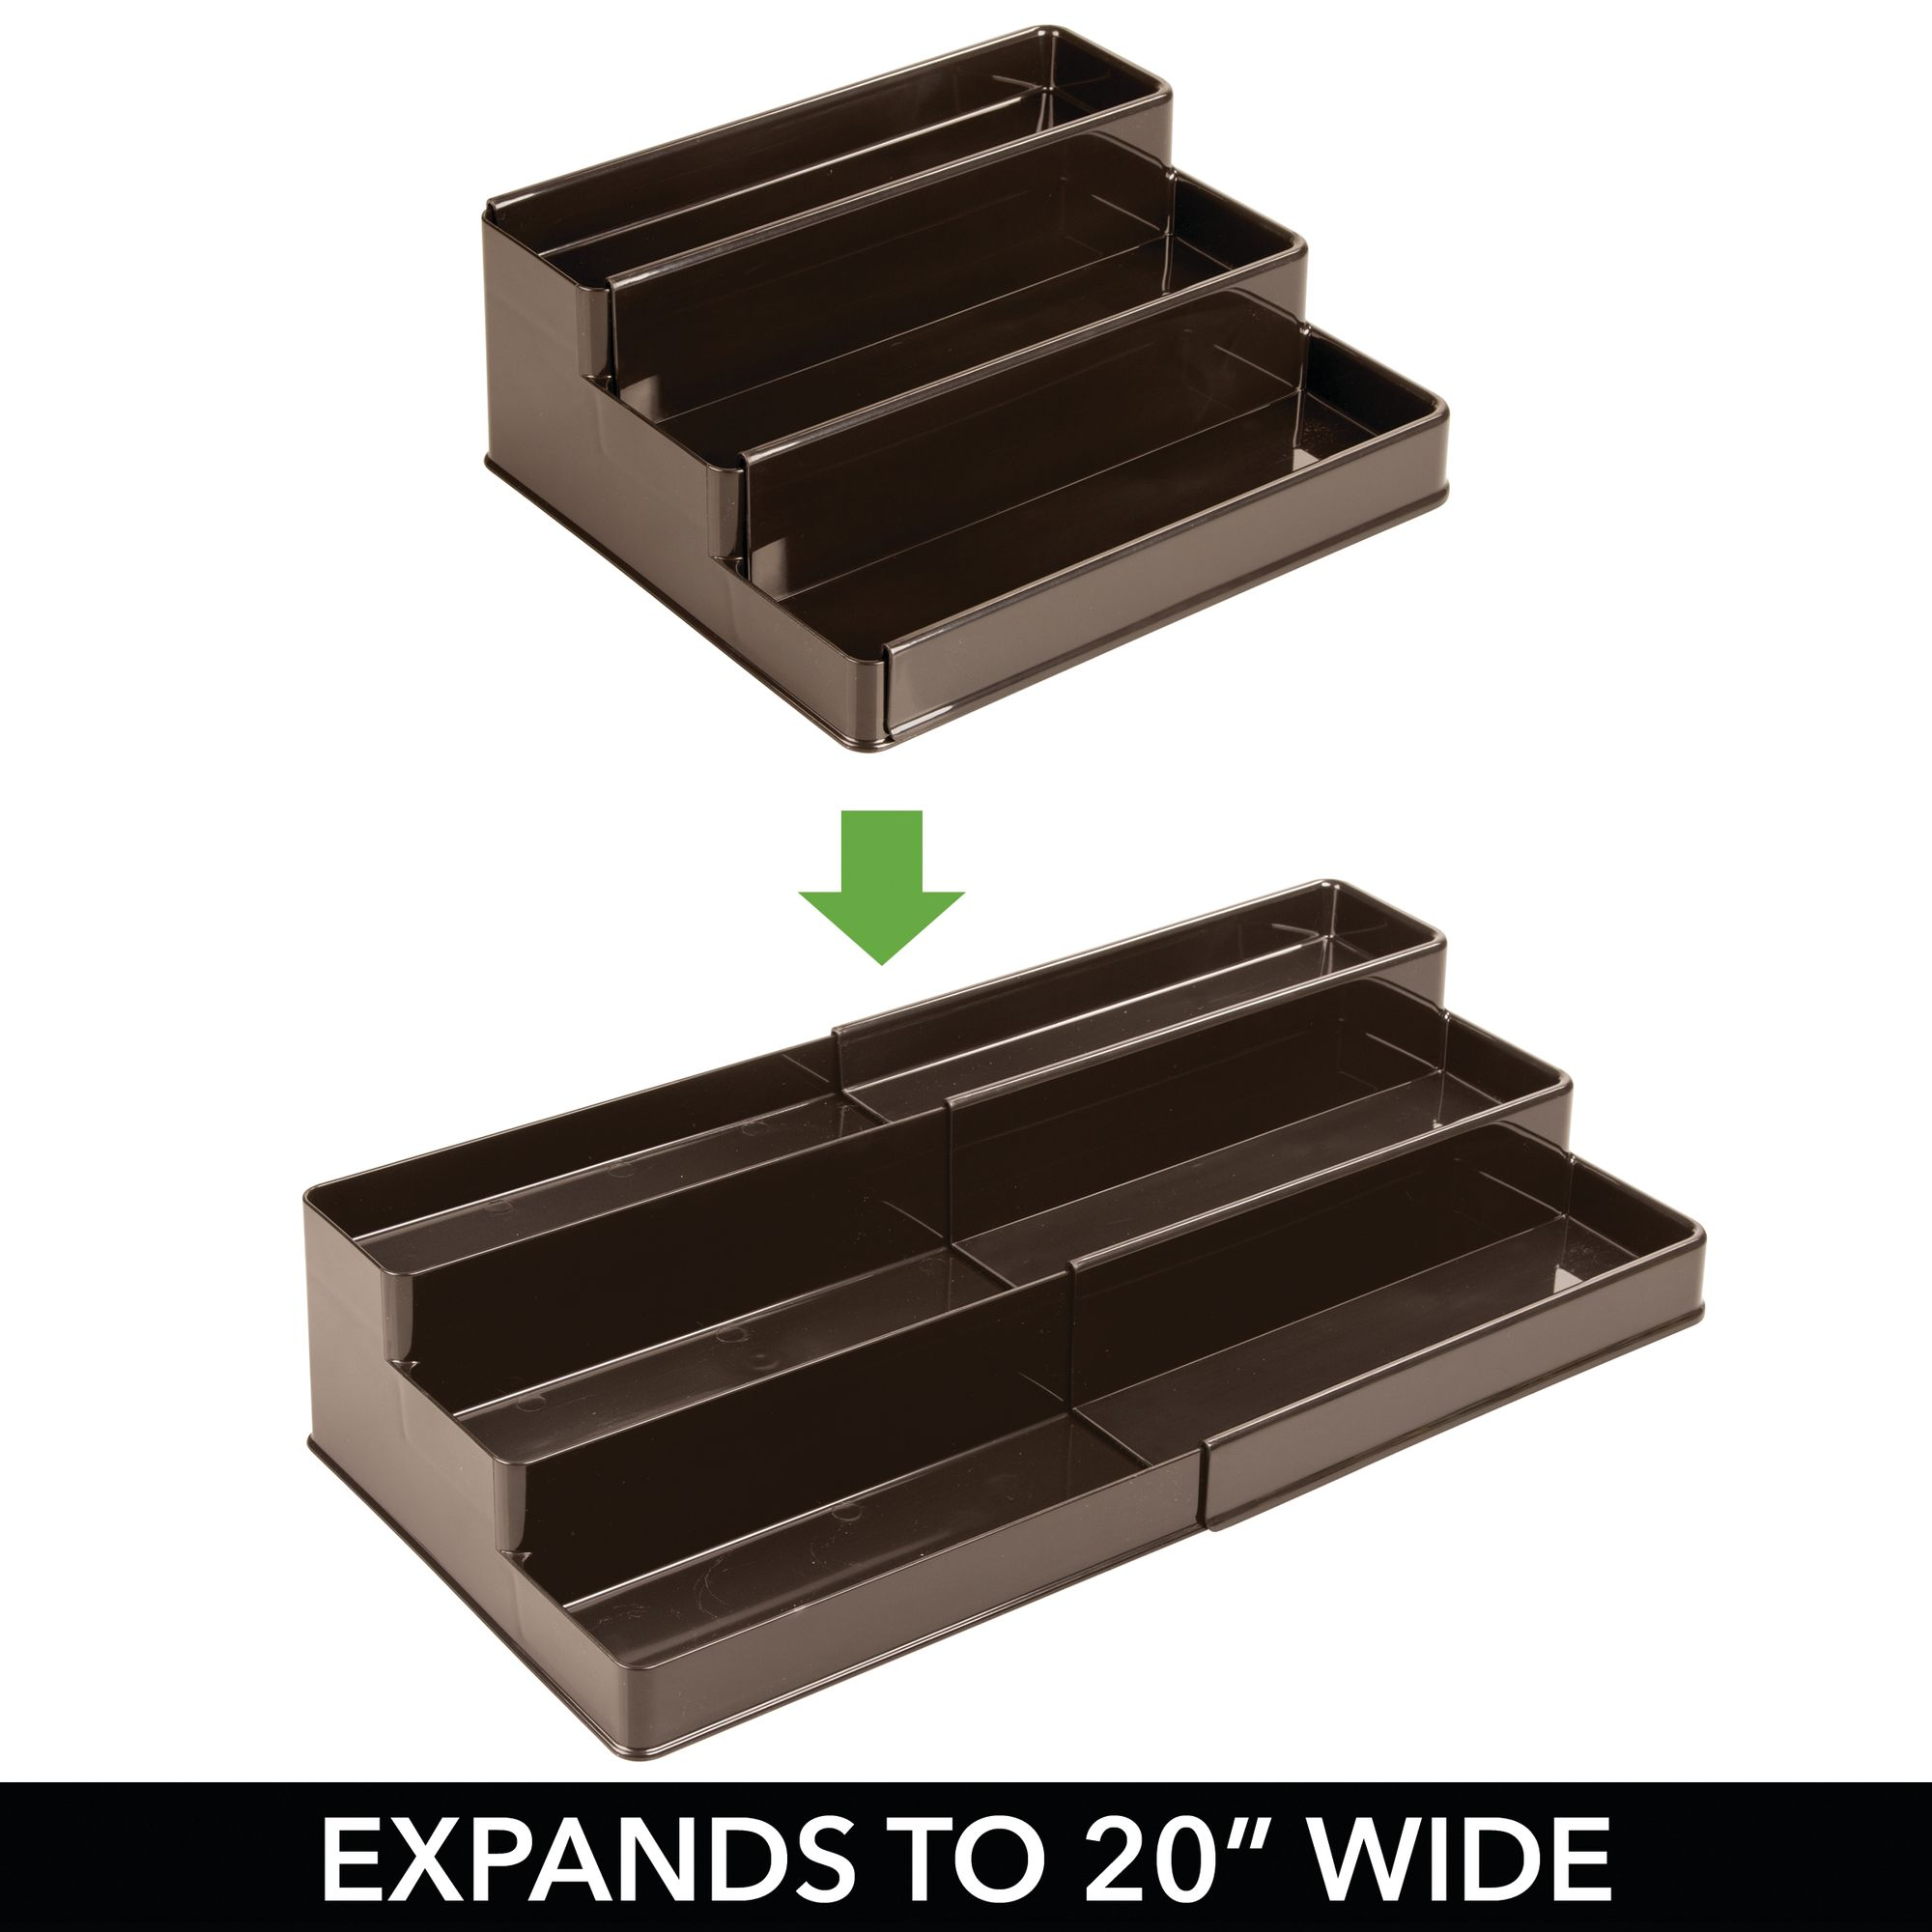 mDesign-Expandable-Kitchen-Cabinet-Pantry-Organizer-Spice-Rack thumbnail 20